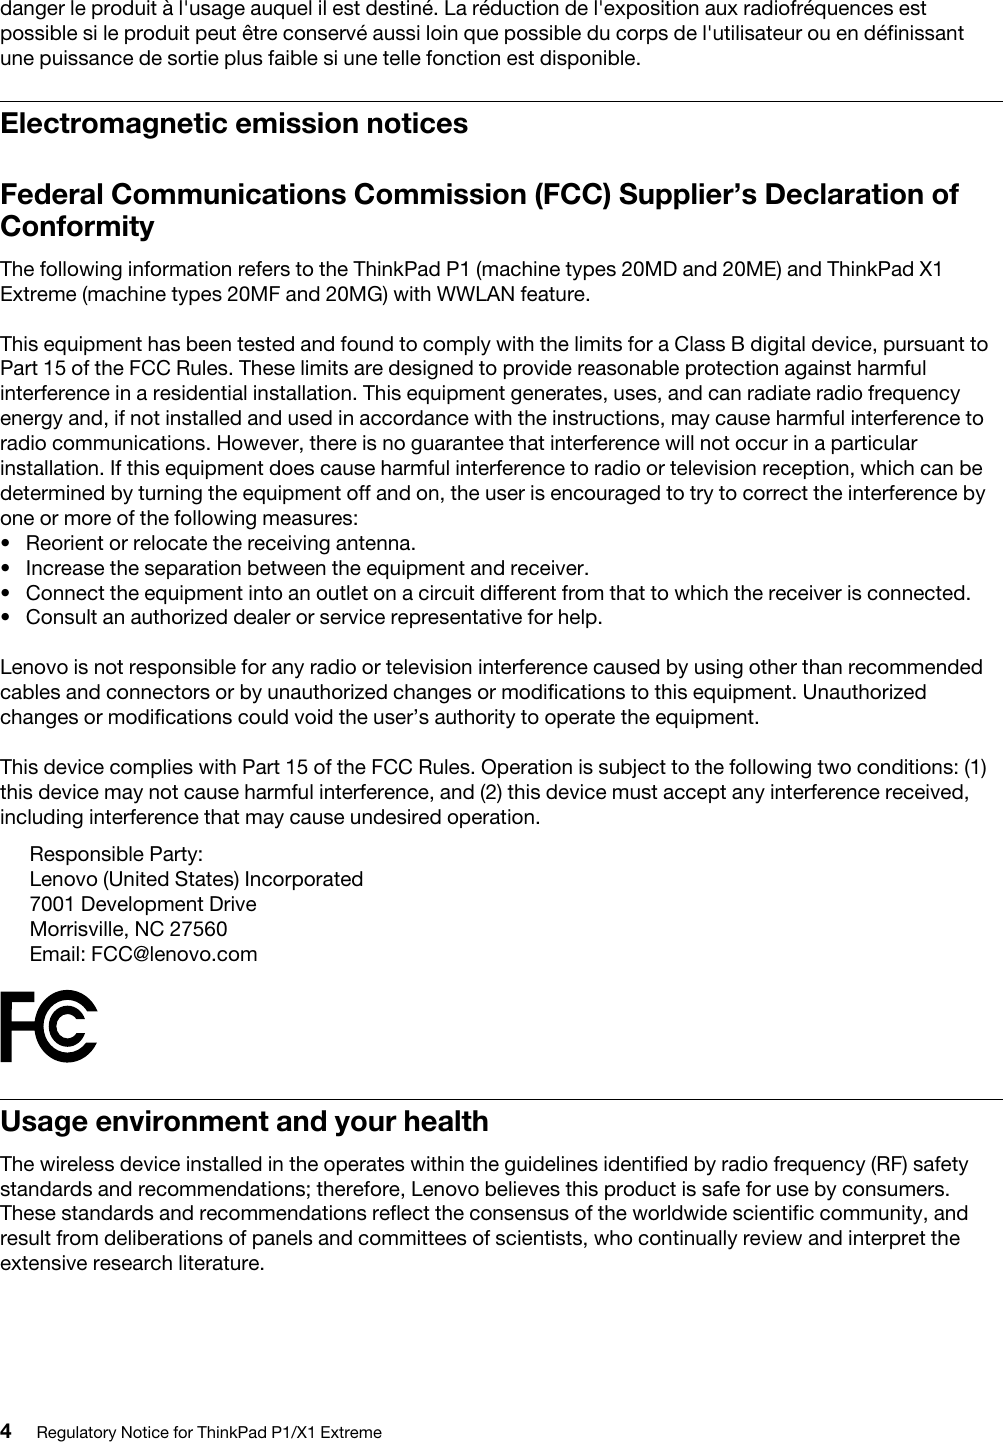 Lenovo Regulatory Notice For ThinkPad P1/X1 Extreme Think